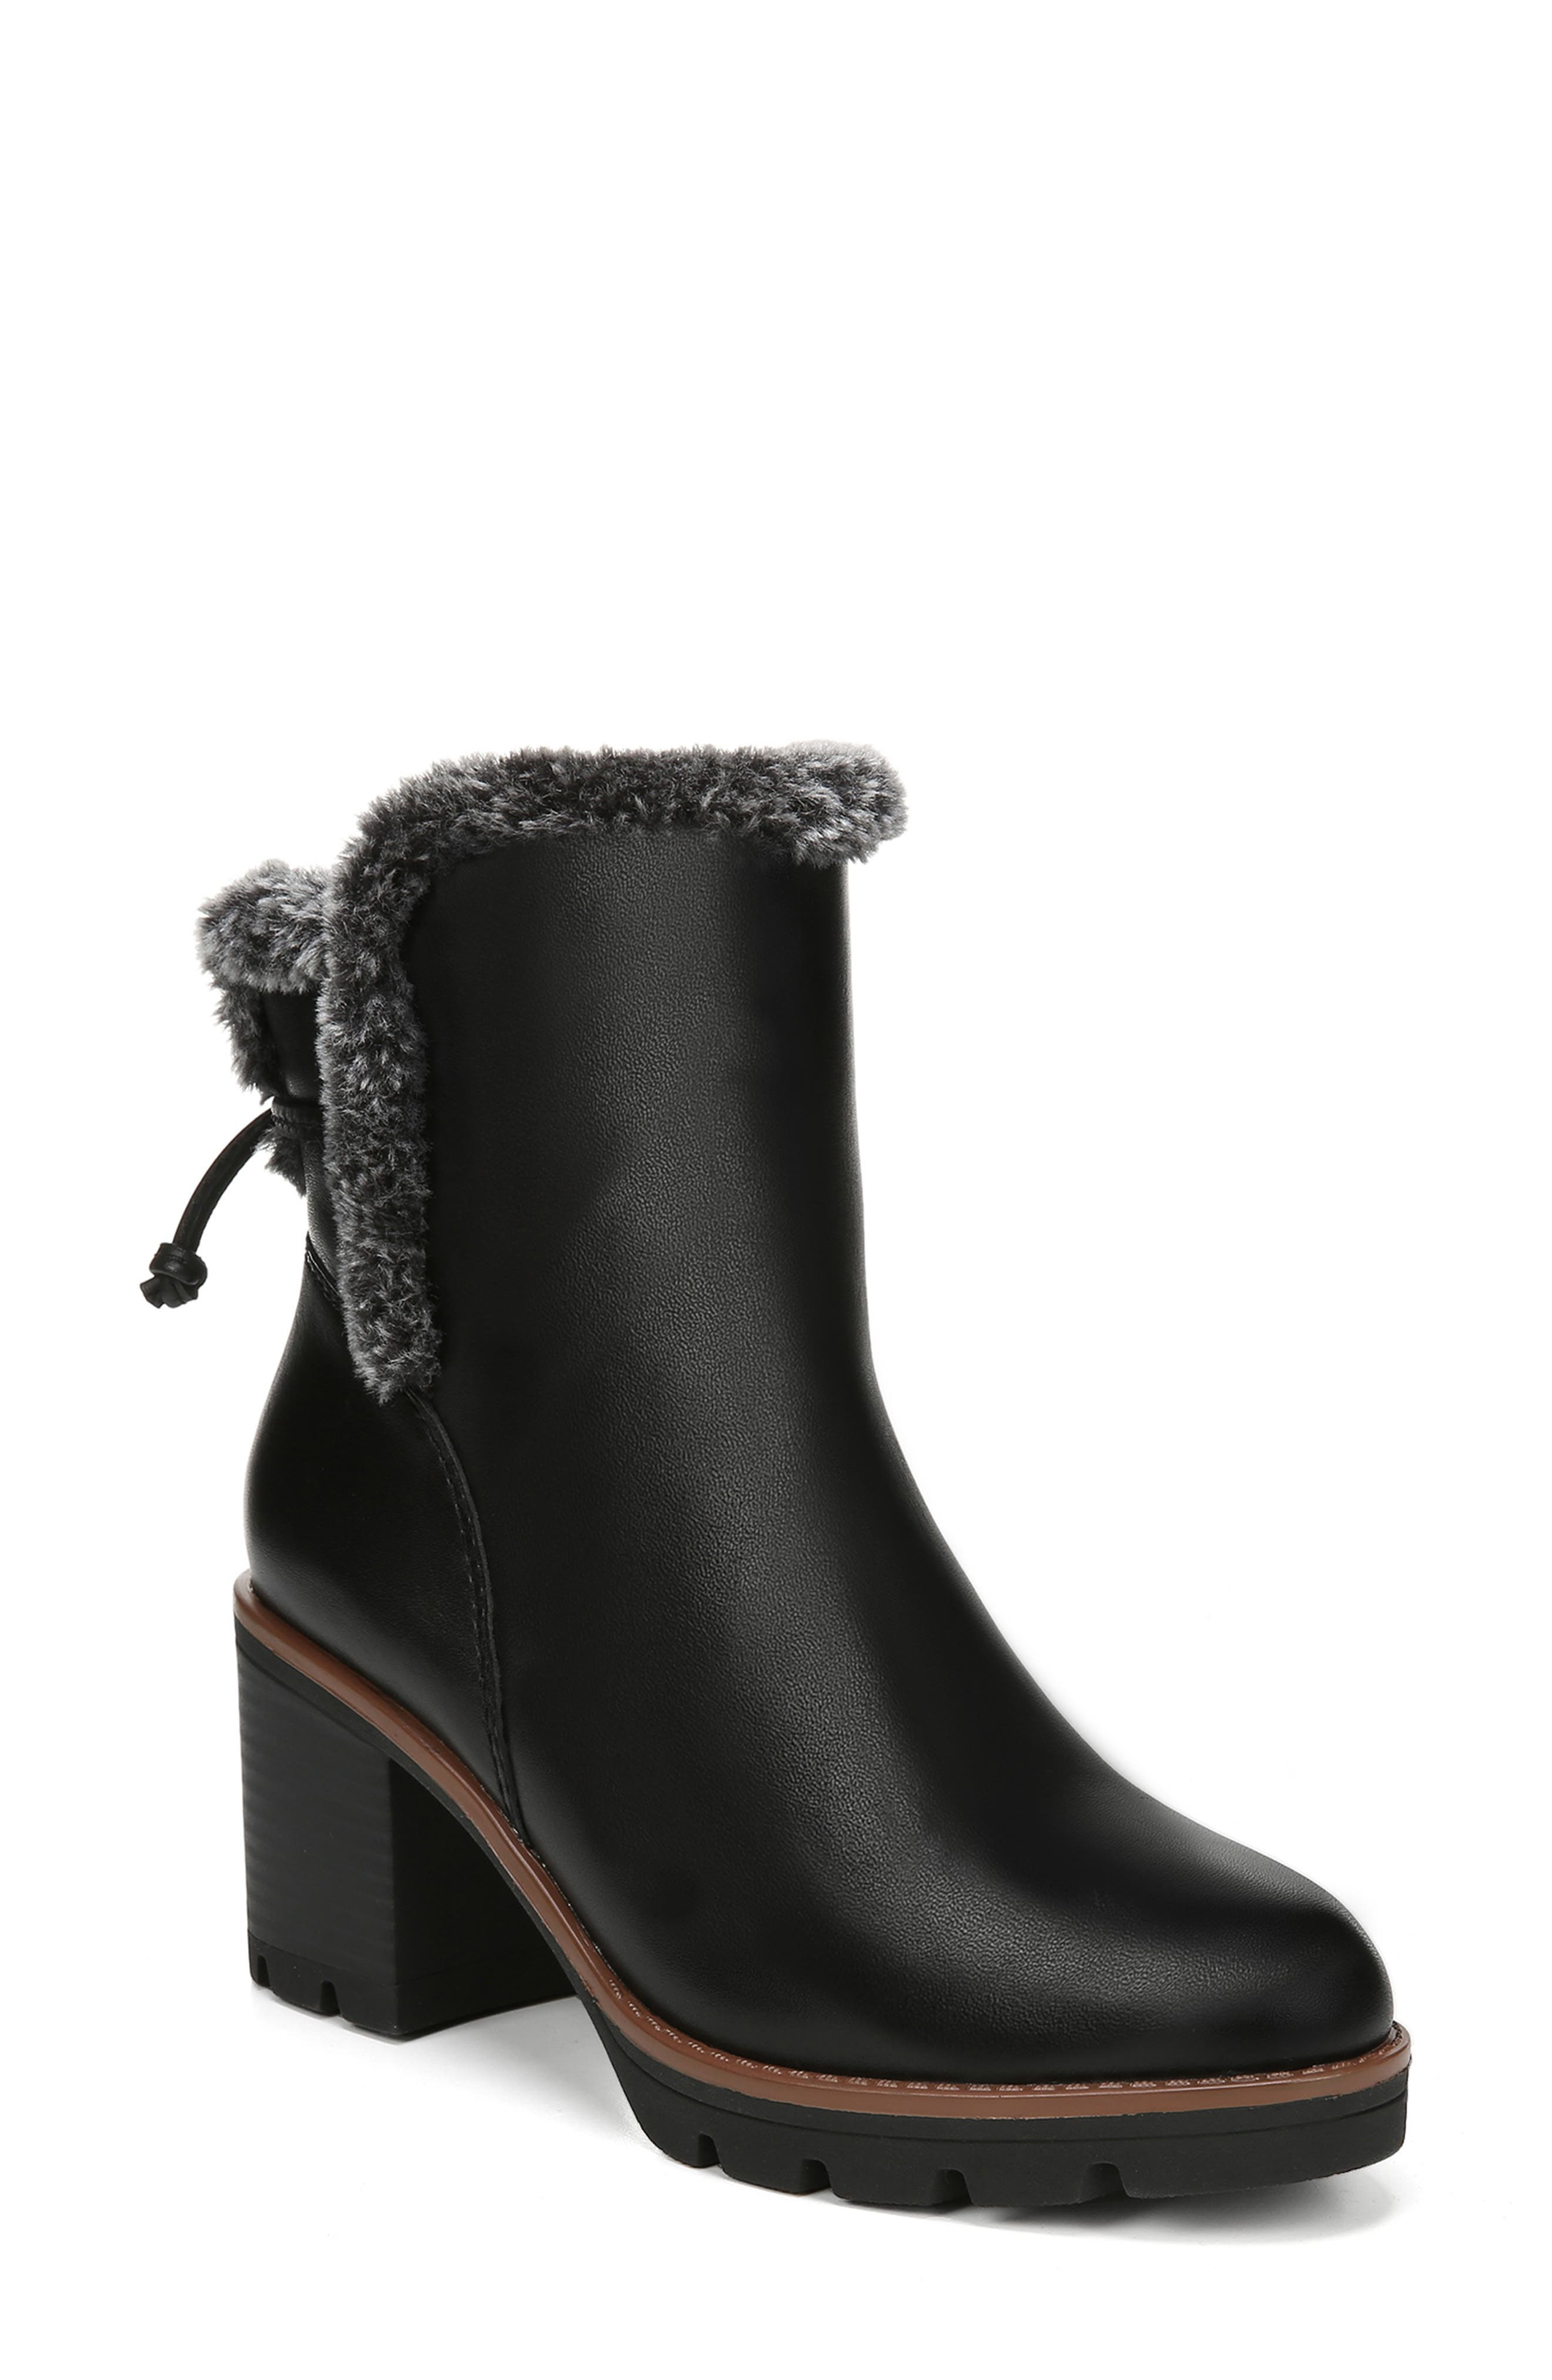 1950s Style Shoes | Heels, Flats, Saddle Shoes Womens Naturalizer Valene Waterproof Bootie Size 8 W - Black $169.95 AT vintagedancer.com